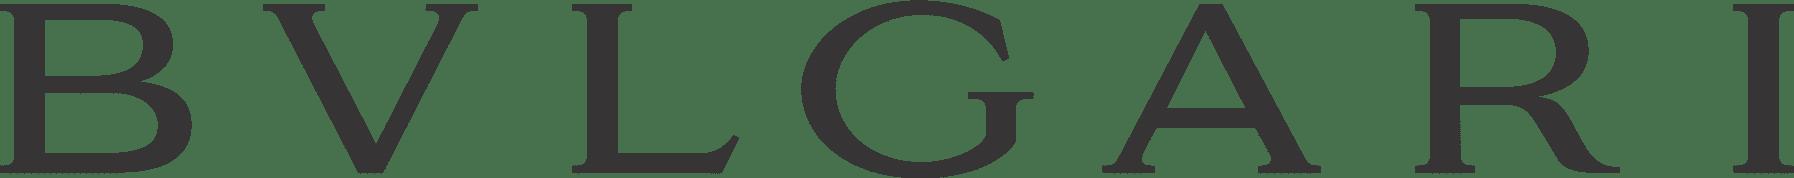 https://ik.imagekit.io/657zfducf/image/data/sunglass-testing/logo/Bvlgari-logo.png